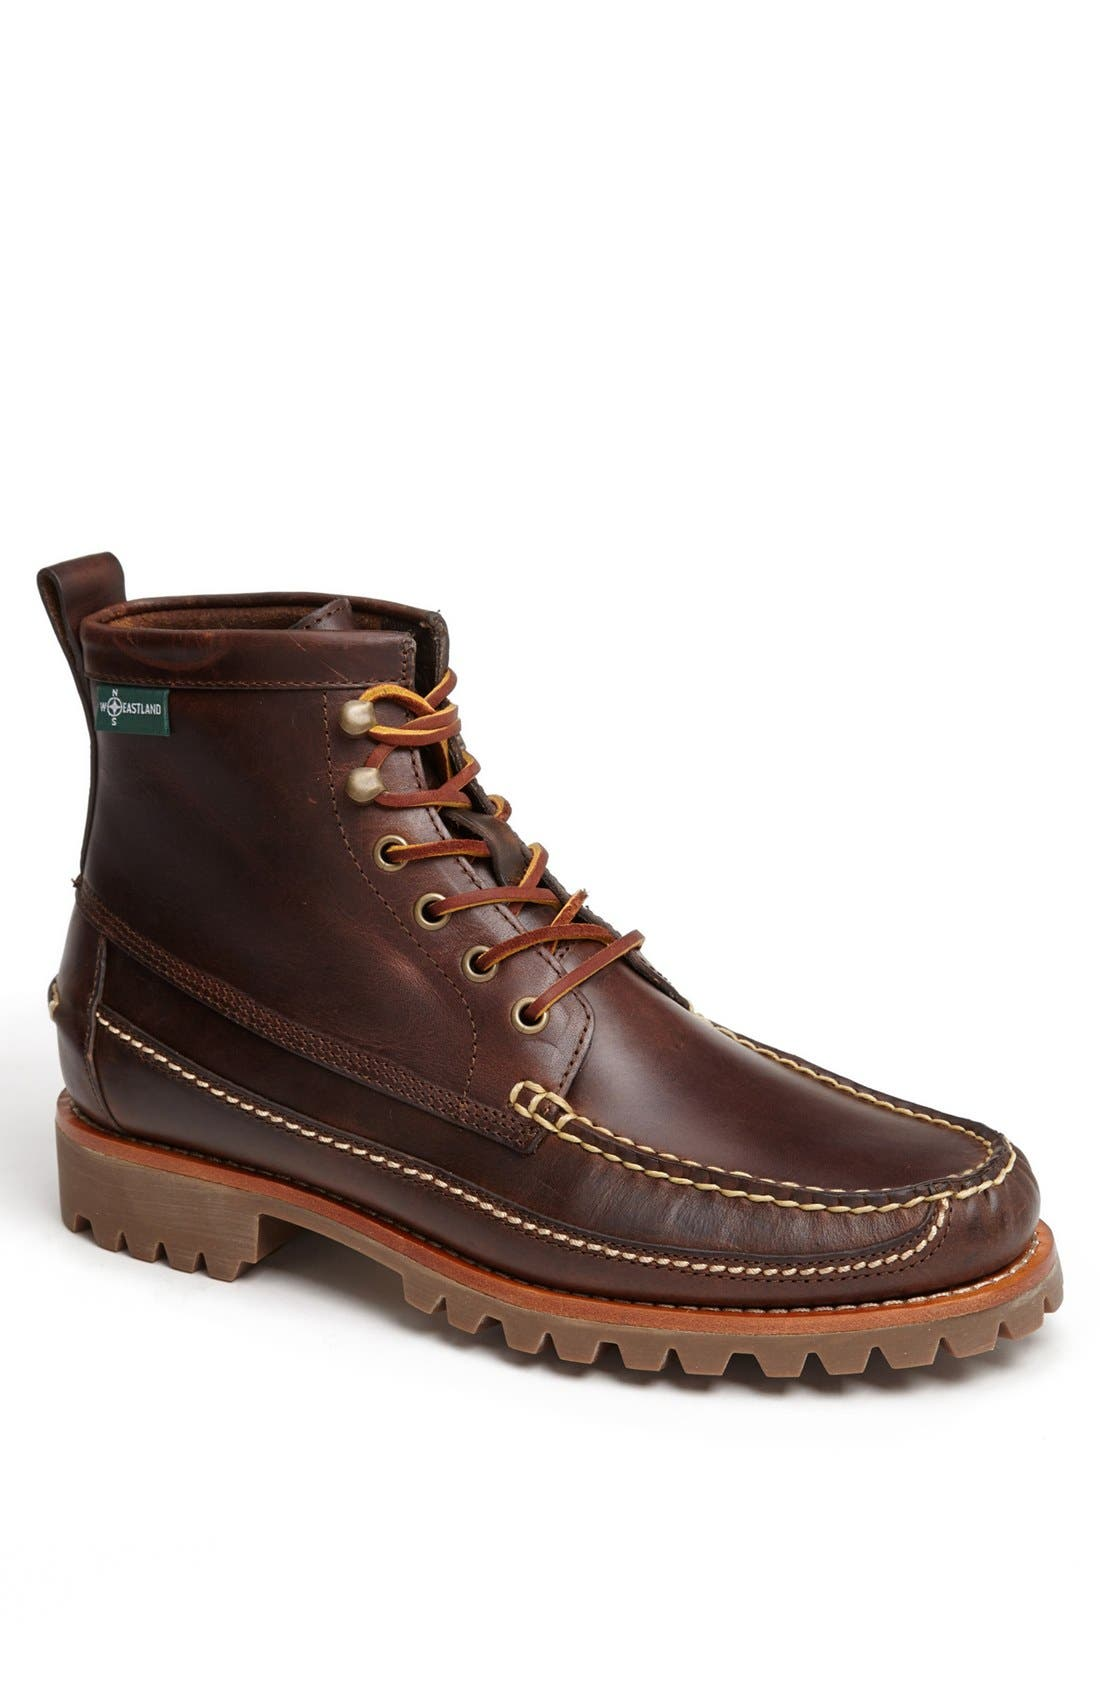 Eastland 'Franconia 1955' Moc Toe Boot